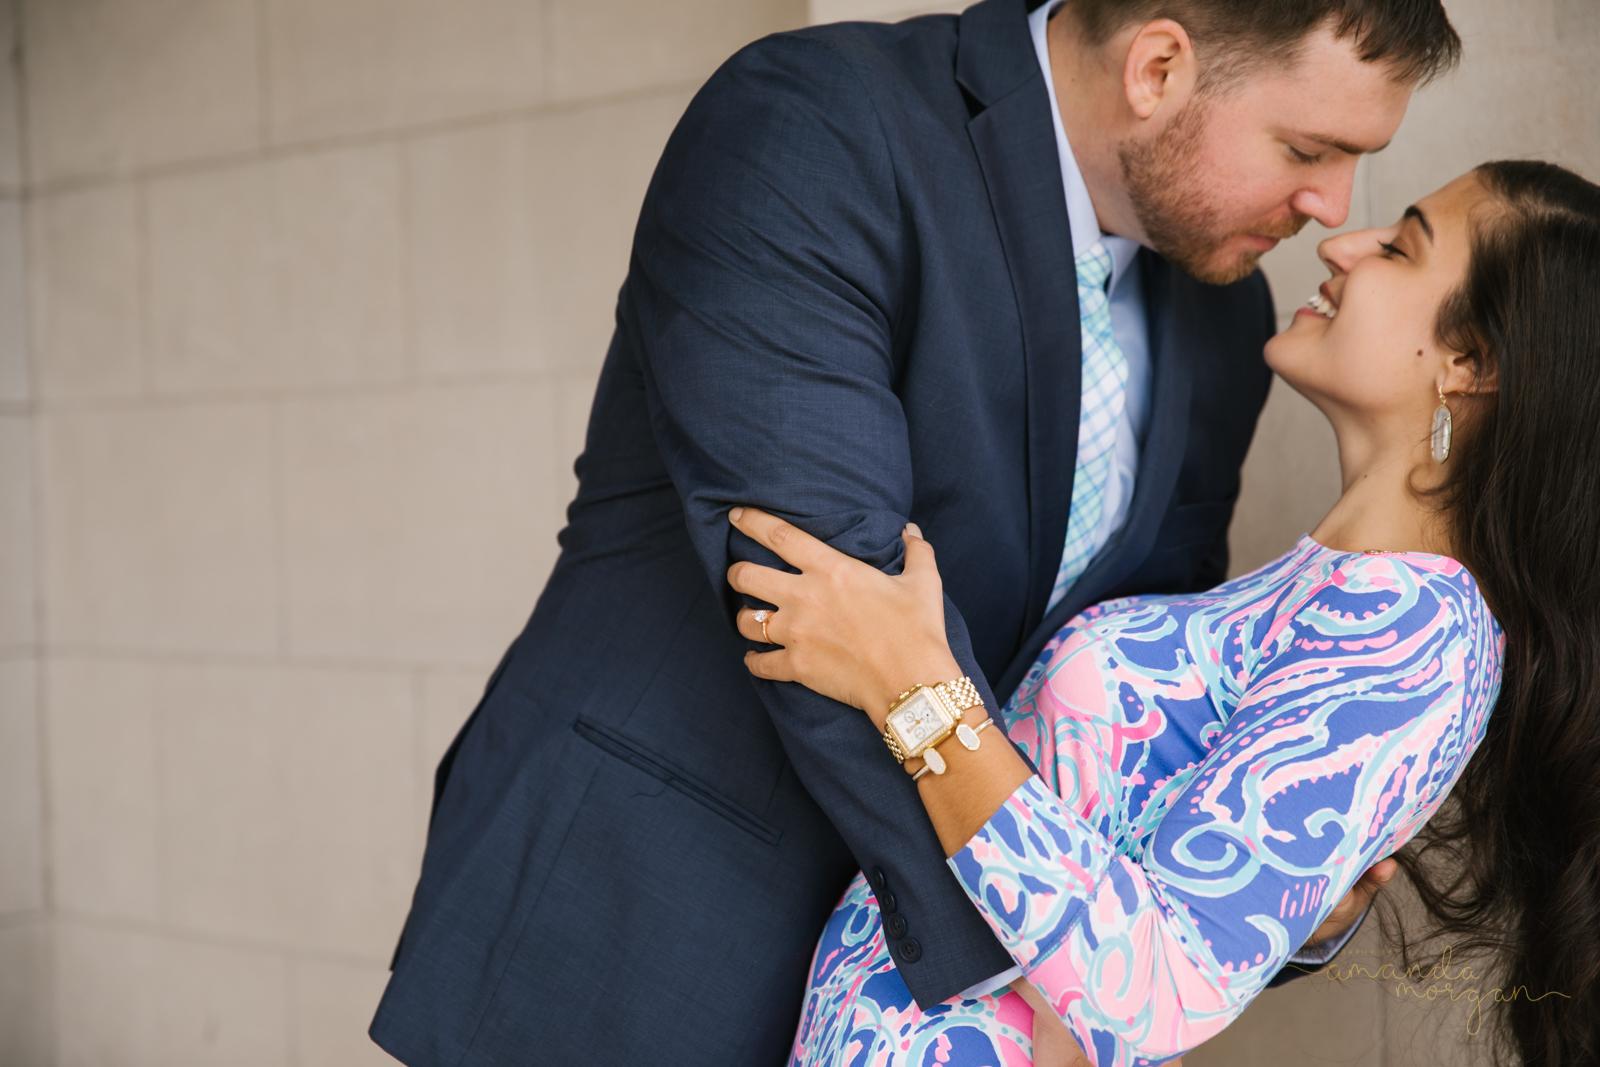 Surprise-Engagement-photos-amanda-morgan-35.jpg